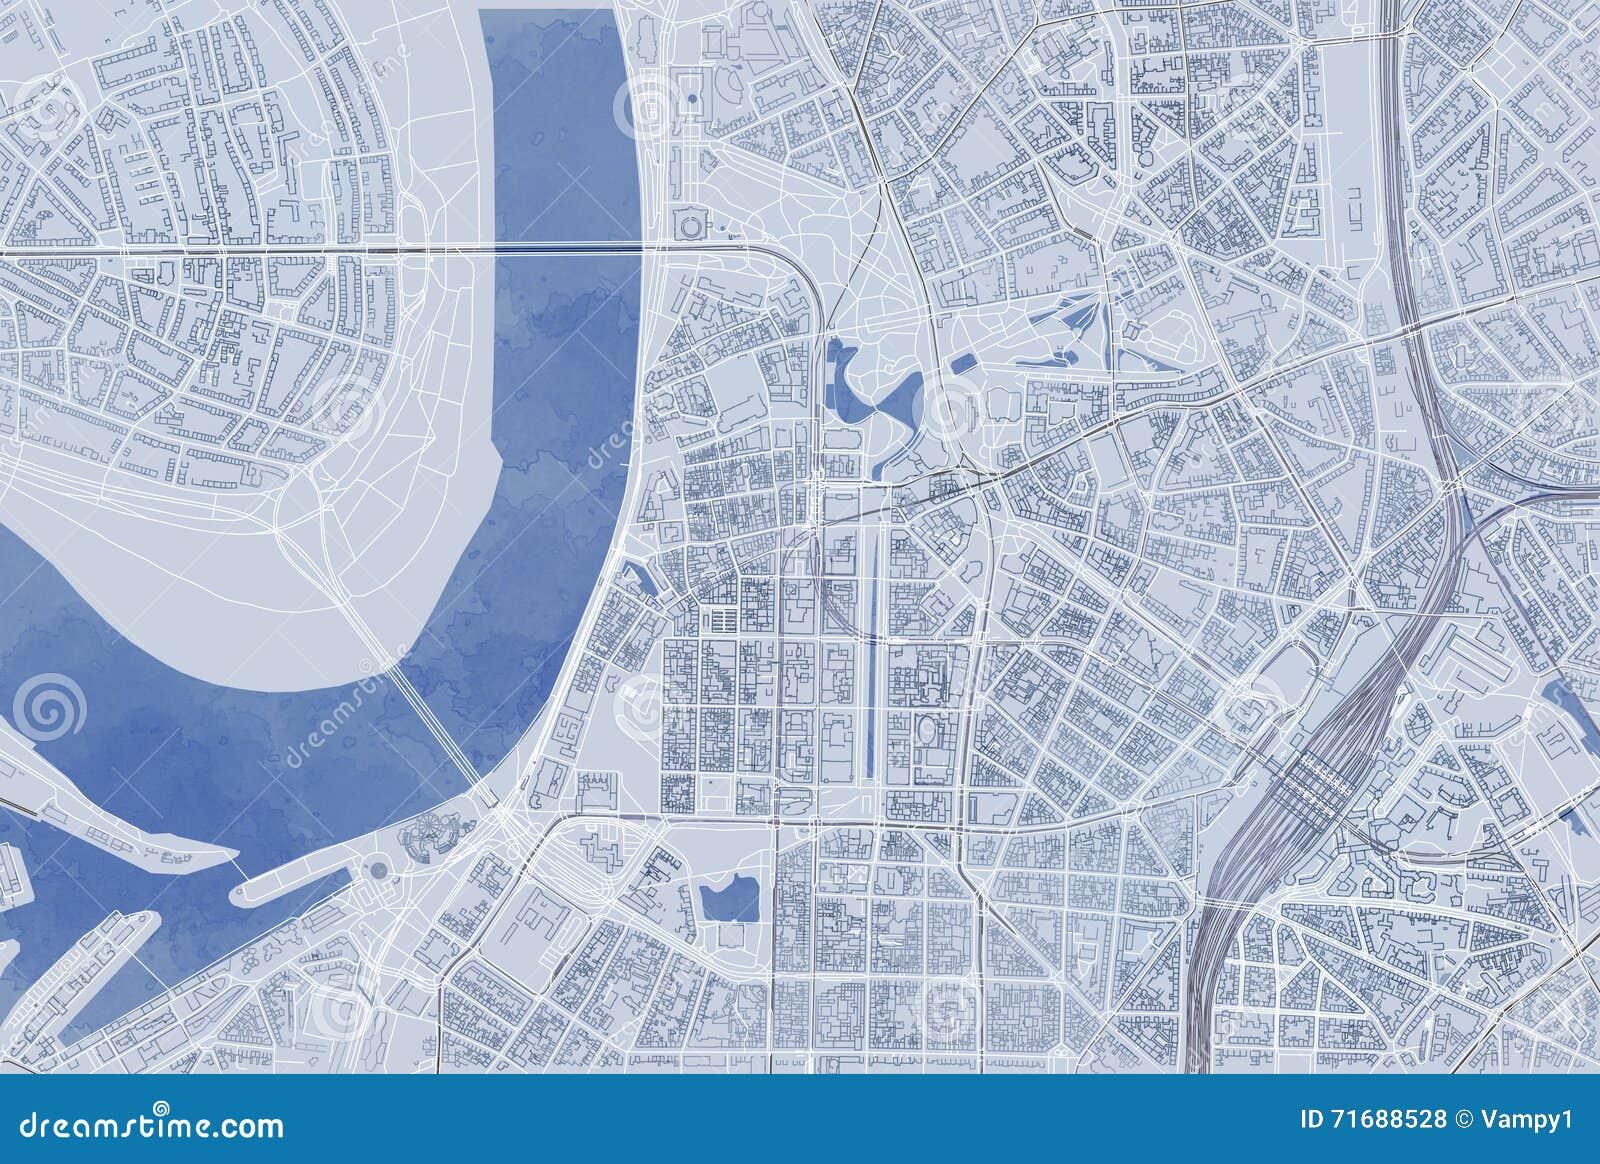 Map of Dusseldorf satellite view hand drawn